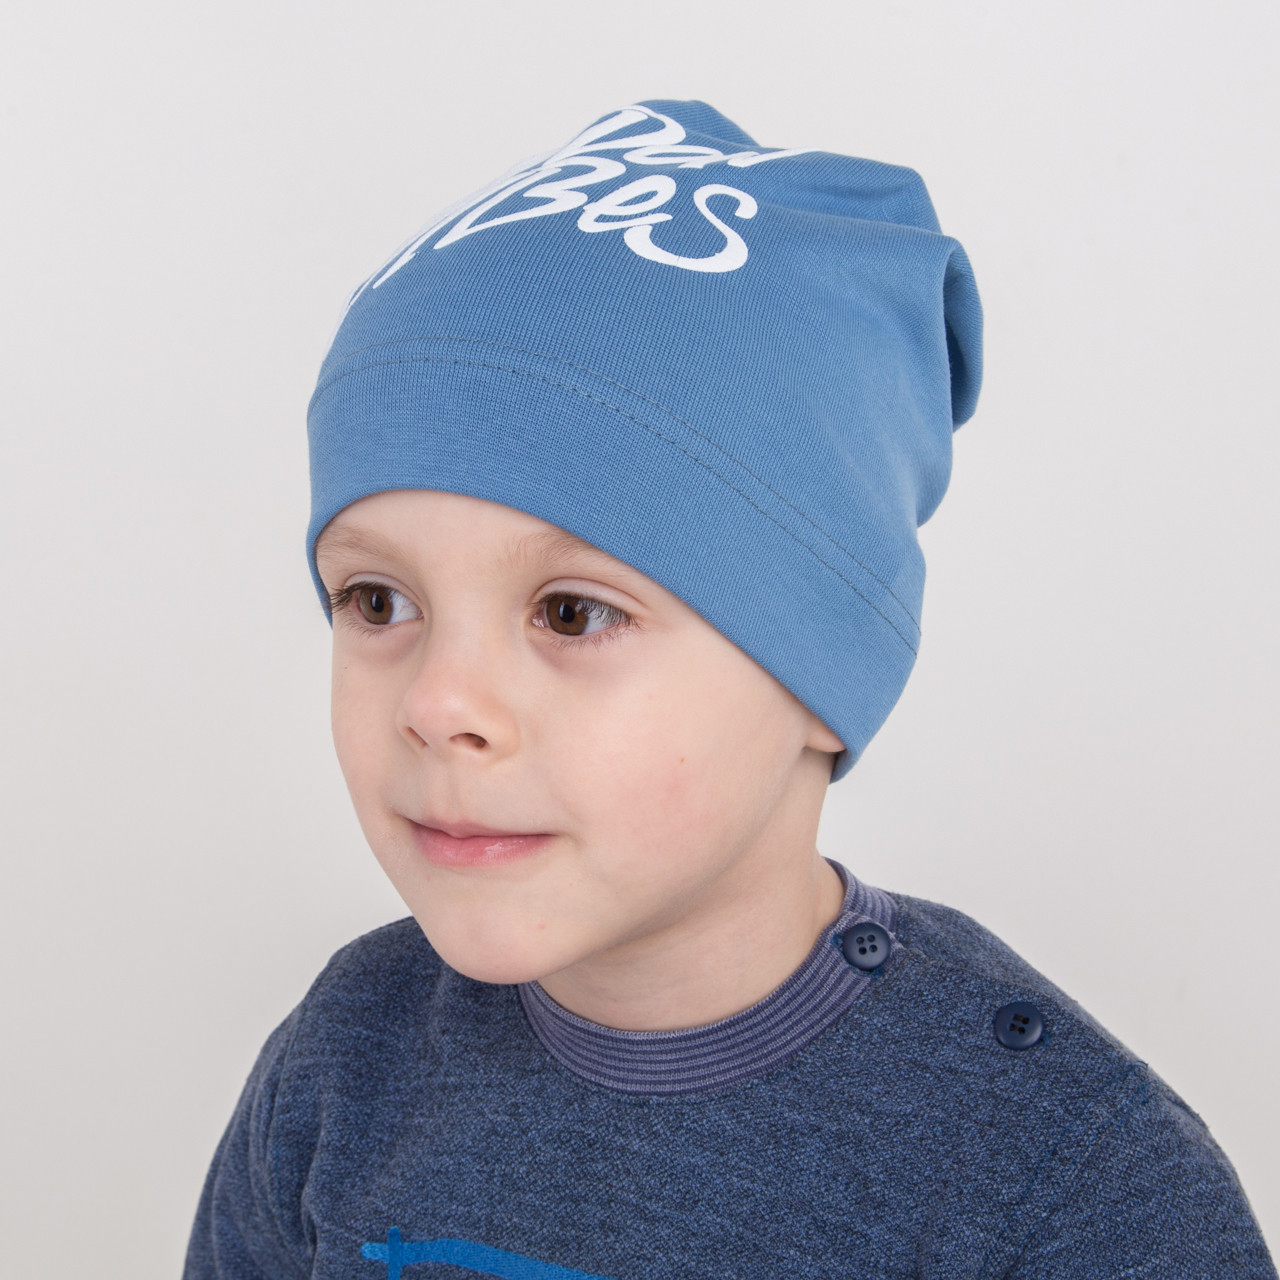 Весенняя шапка сезона на мальчика оптом - London - Артикул 2203